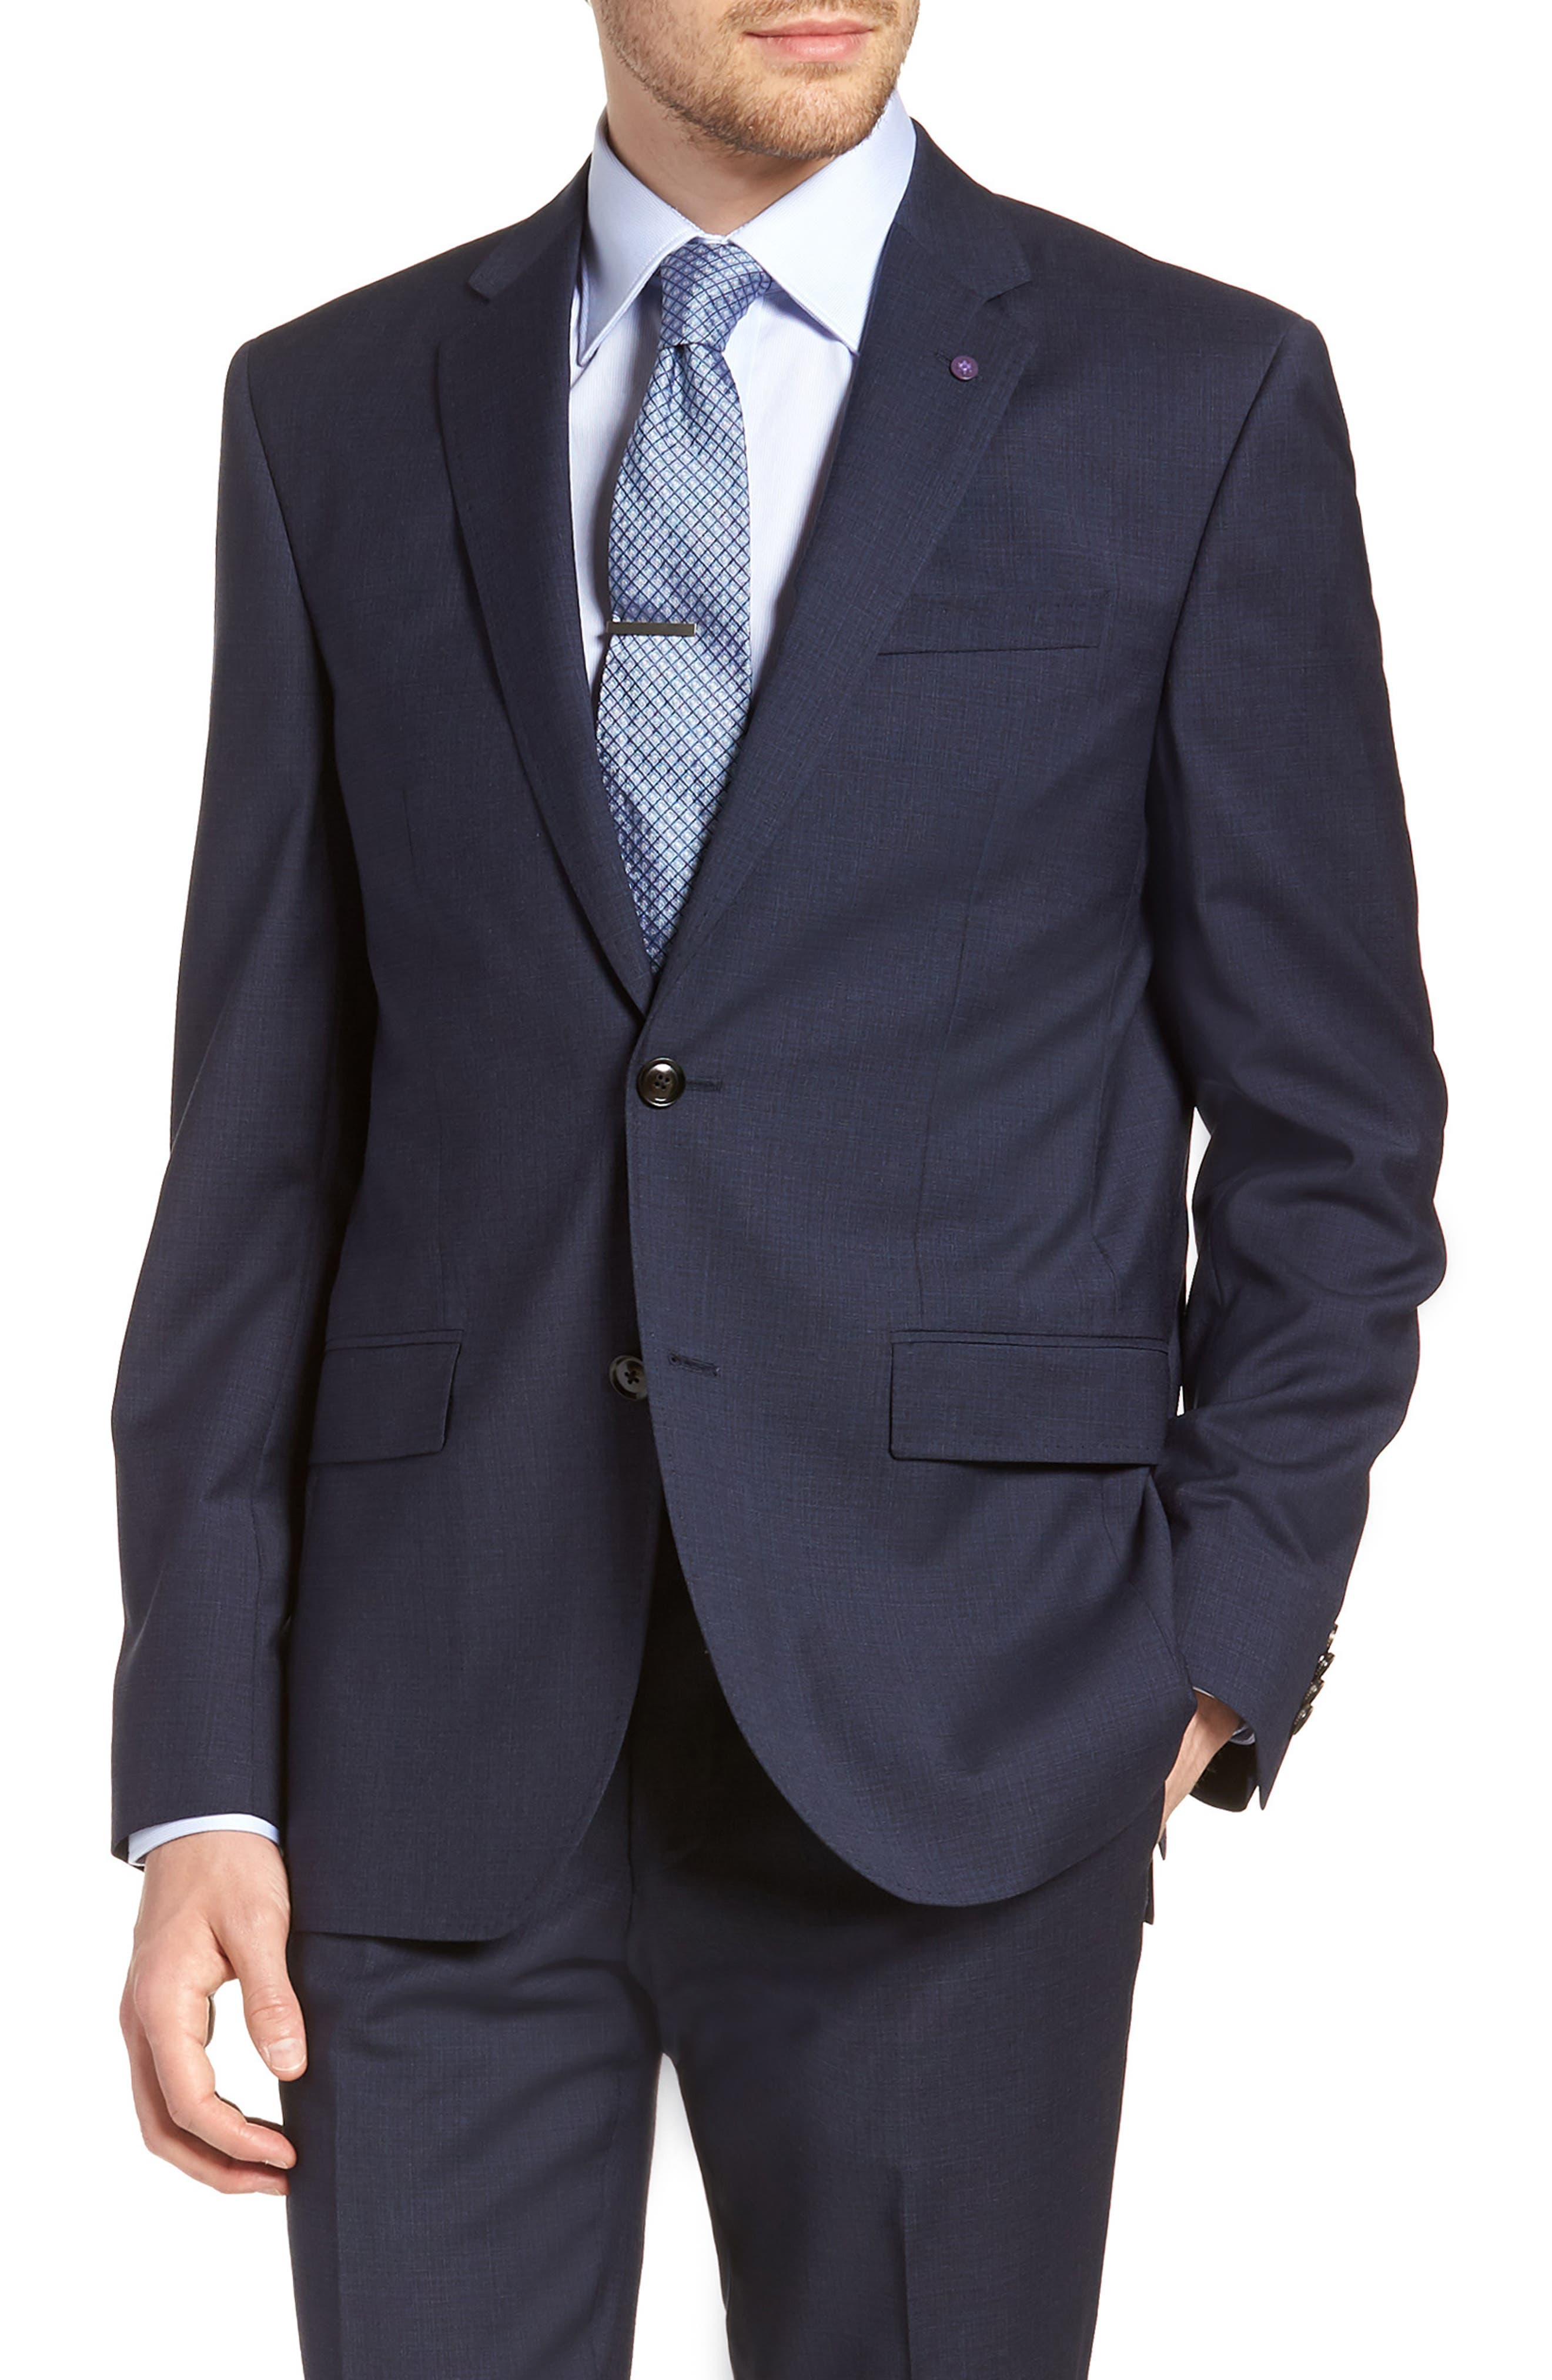 Jay Trim Fit Solid Wool Suit,                             Alternate thumbnail 5, color,                             400